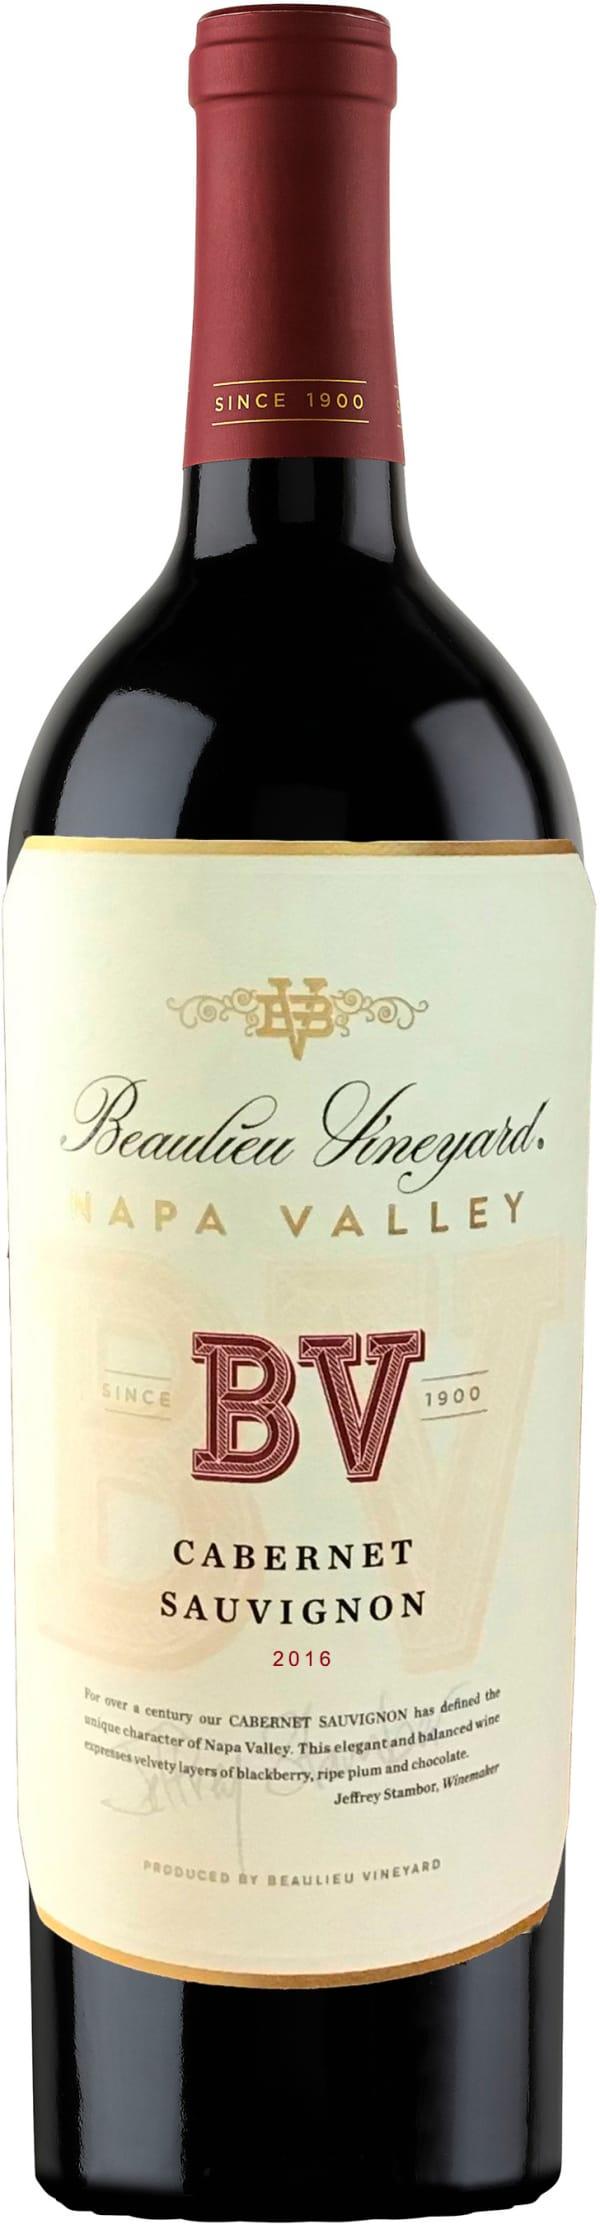 Beaulieu Vineyard Napa Valley Cabernet Sauvignon 2016